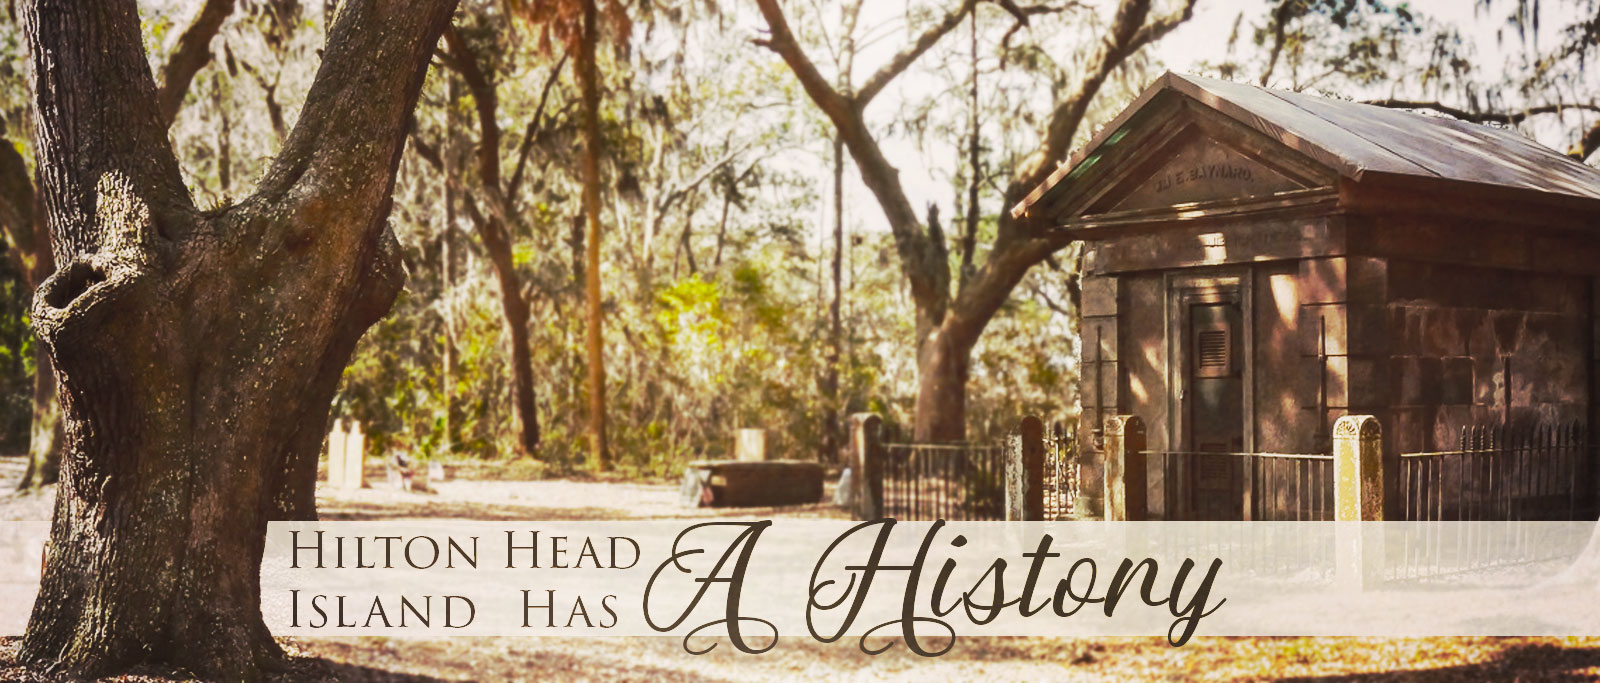 hilton-head-island-has-a-history